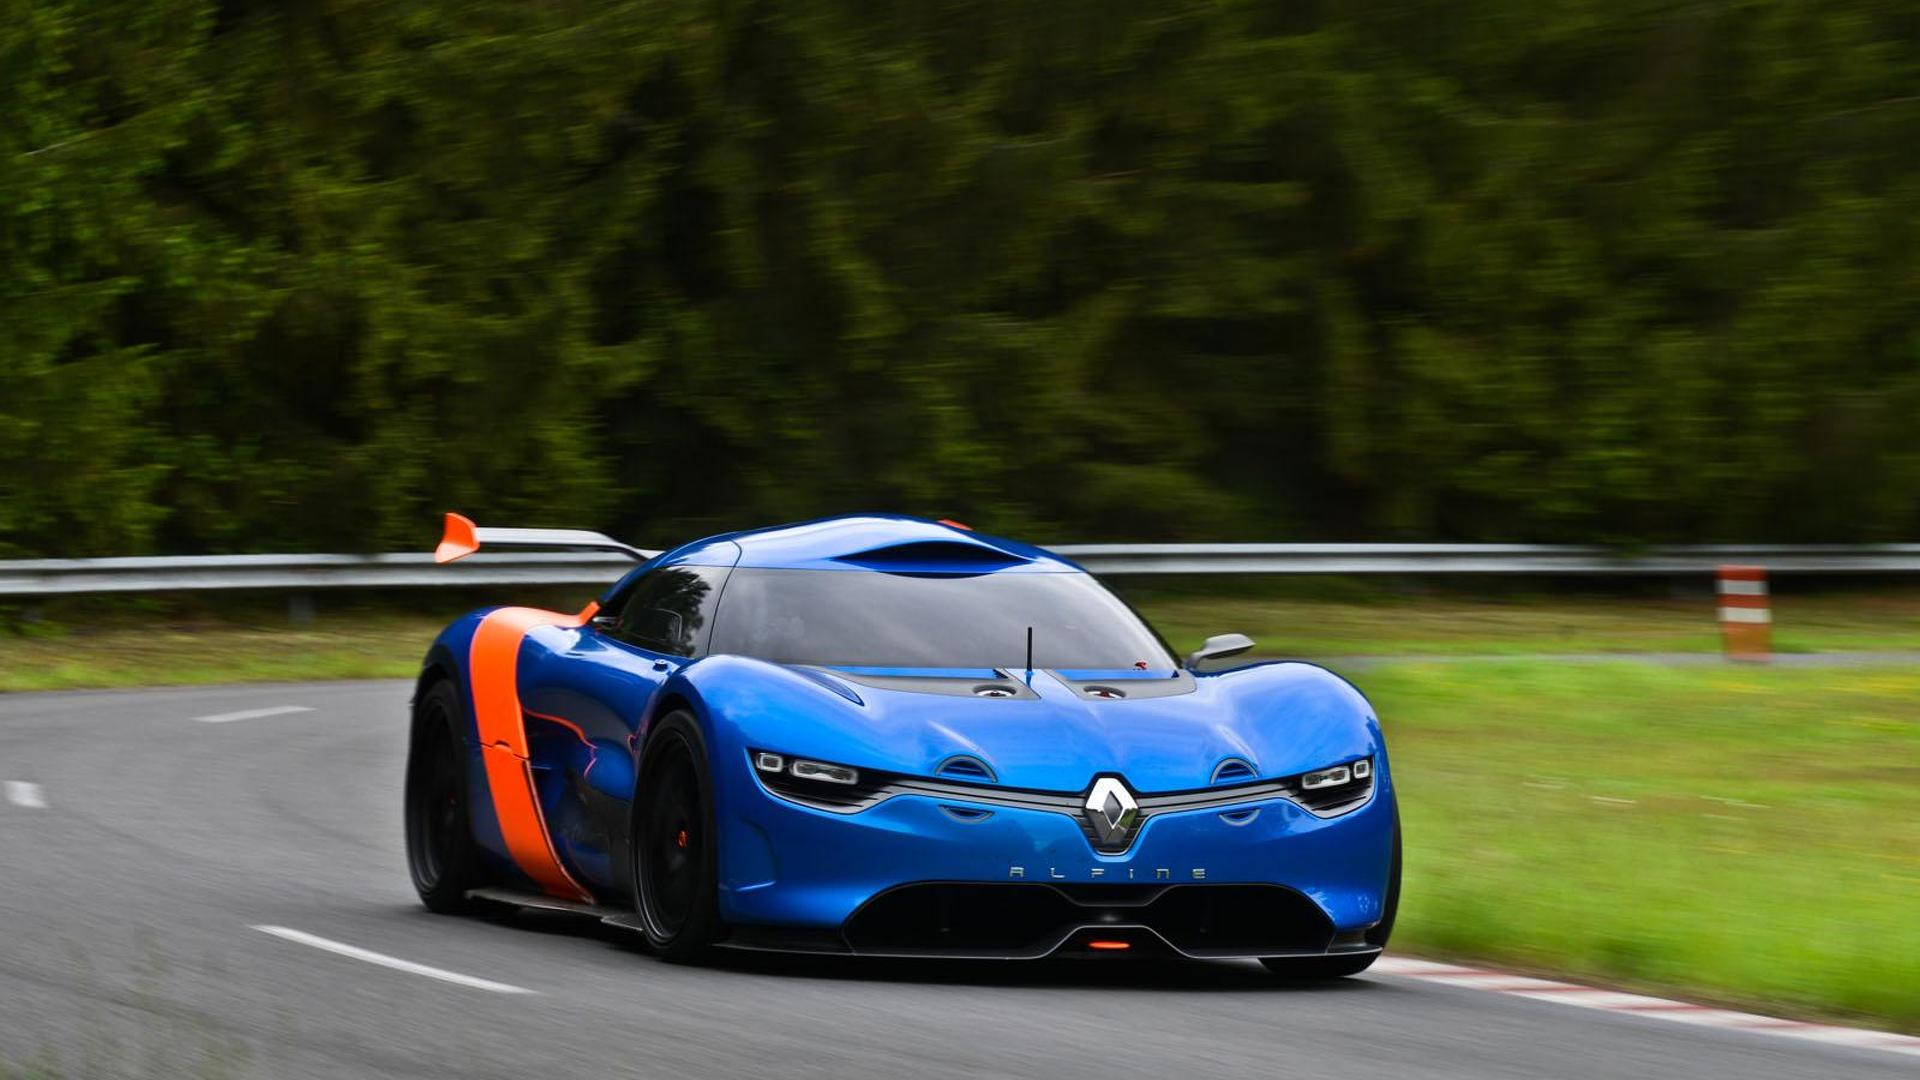 Alpine renault 2016